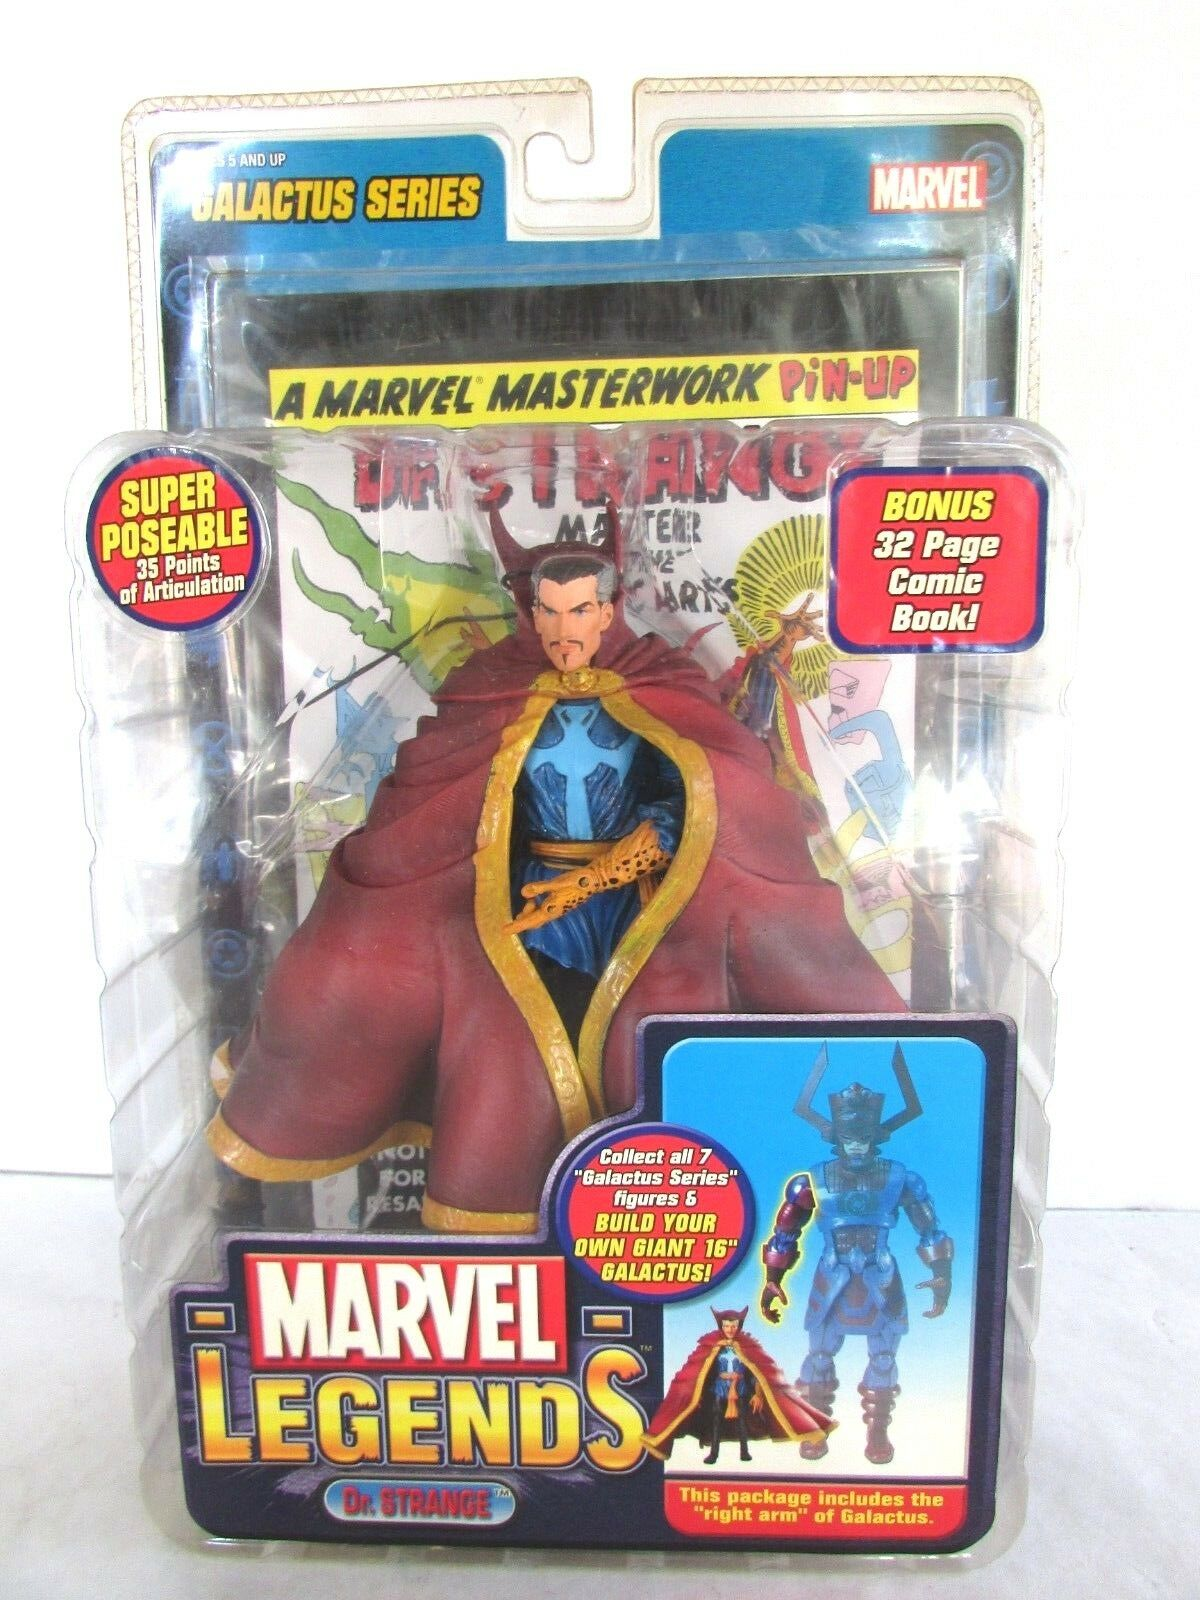 Marvel Legends Super Poseable Dr. Strange - 2005 - Galactus - Bonus Comic Book